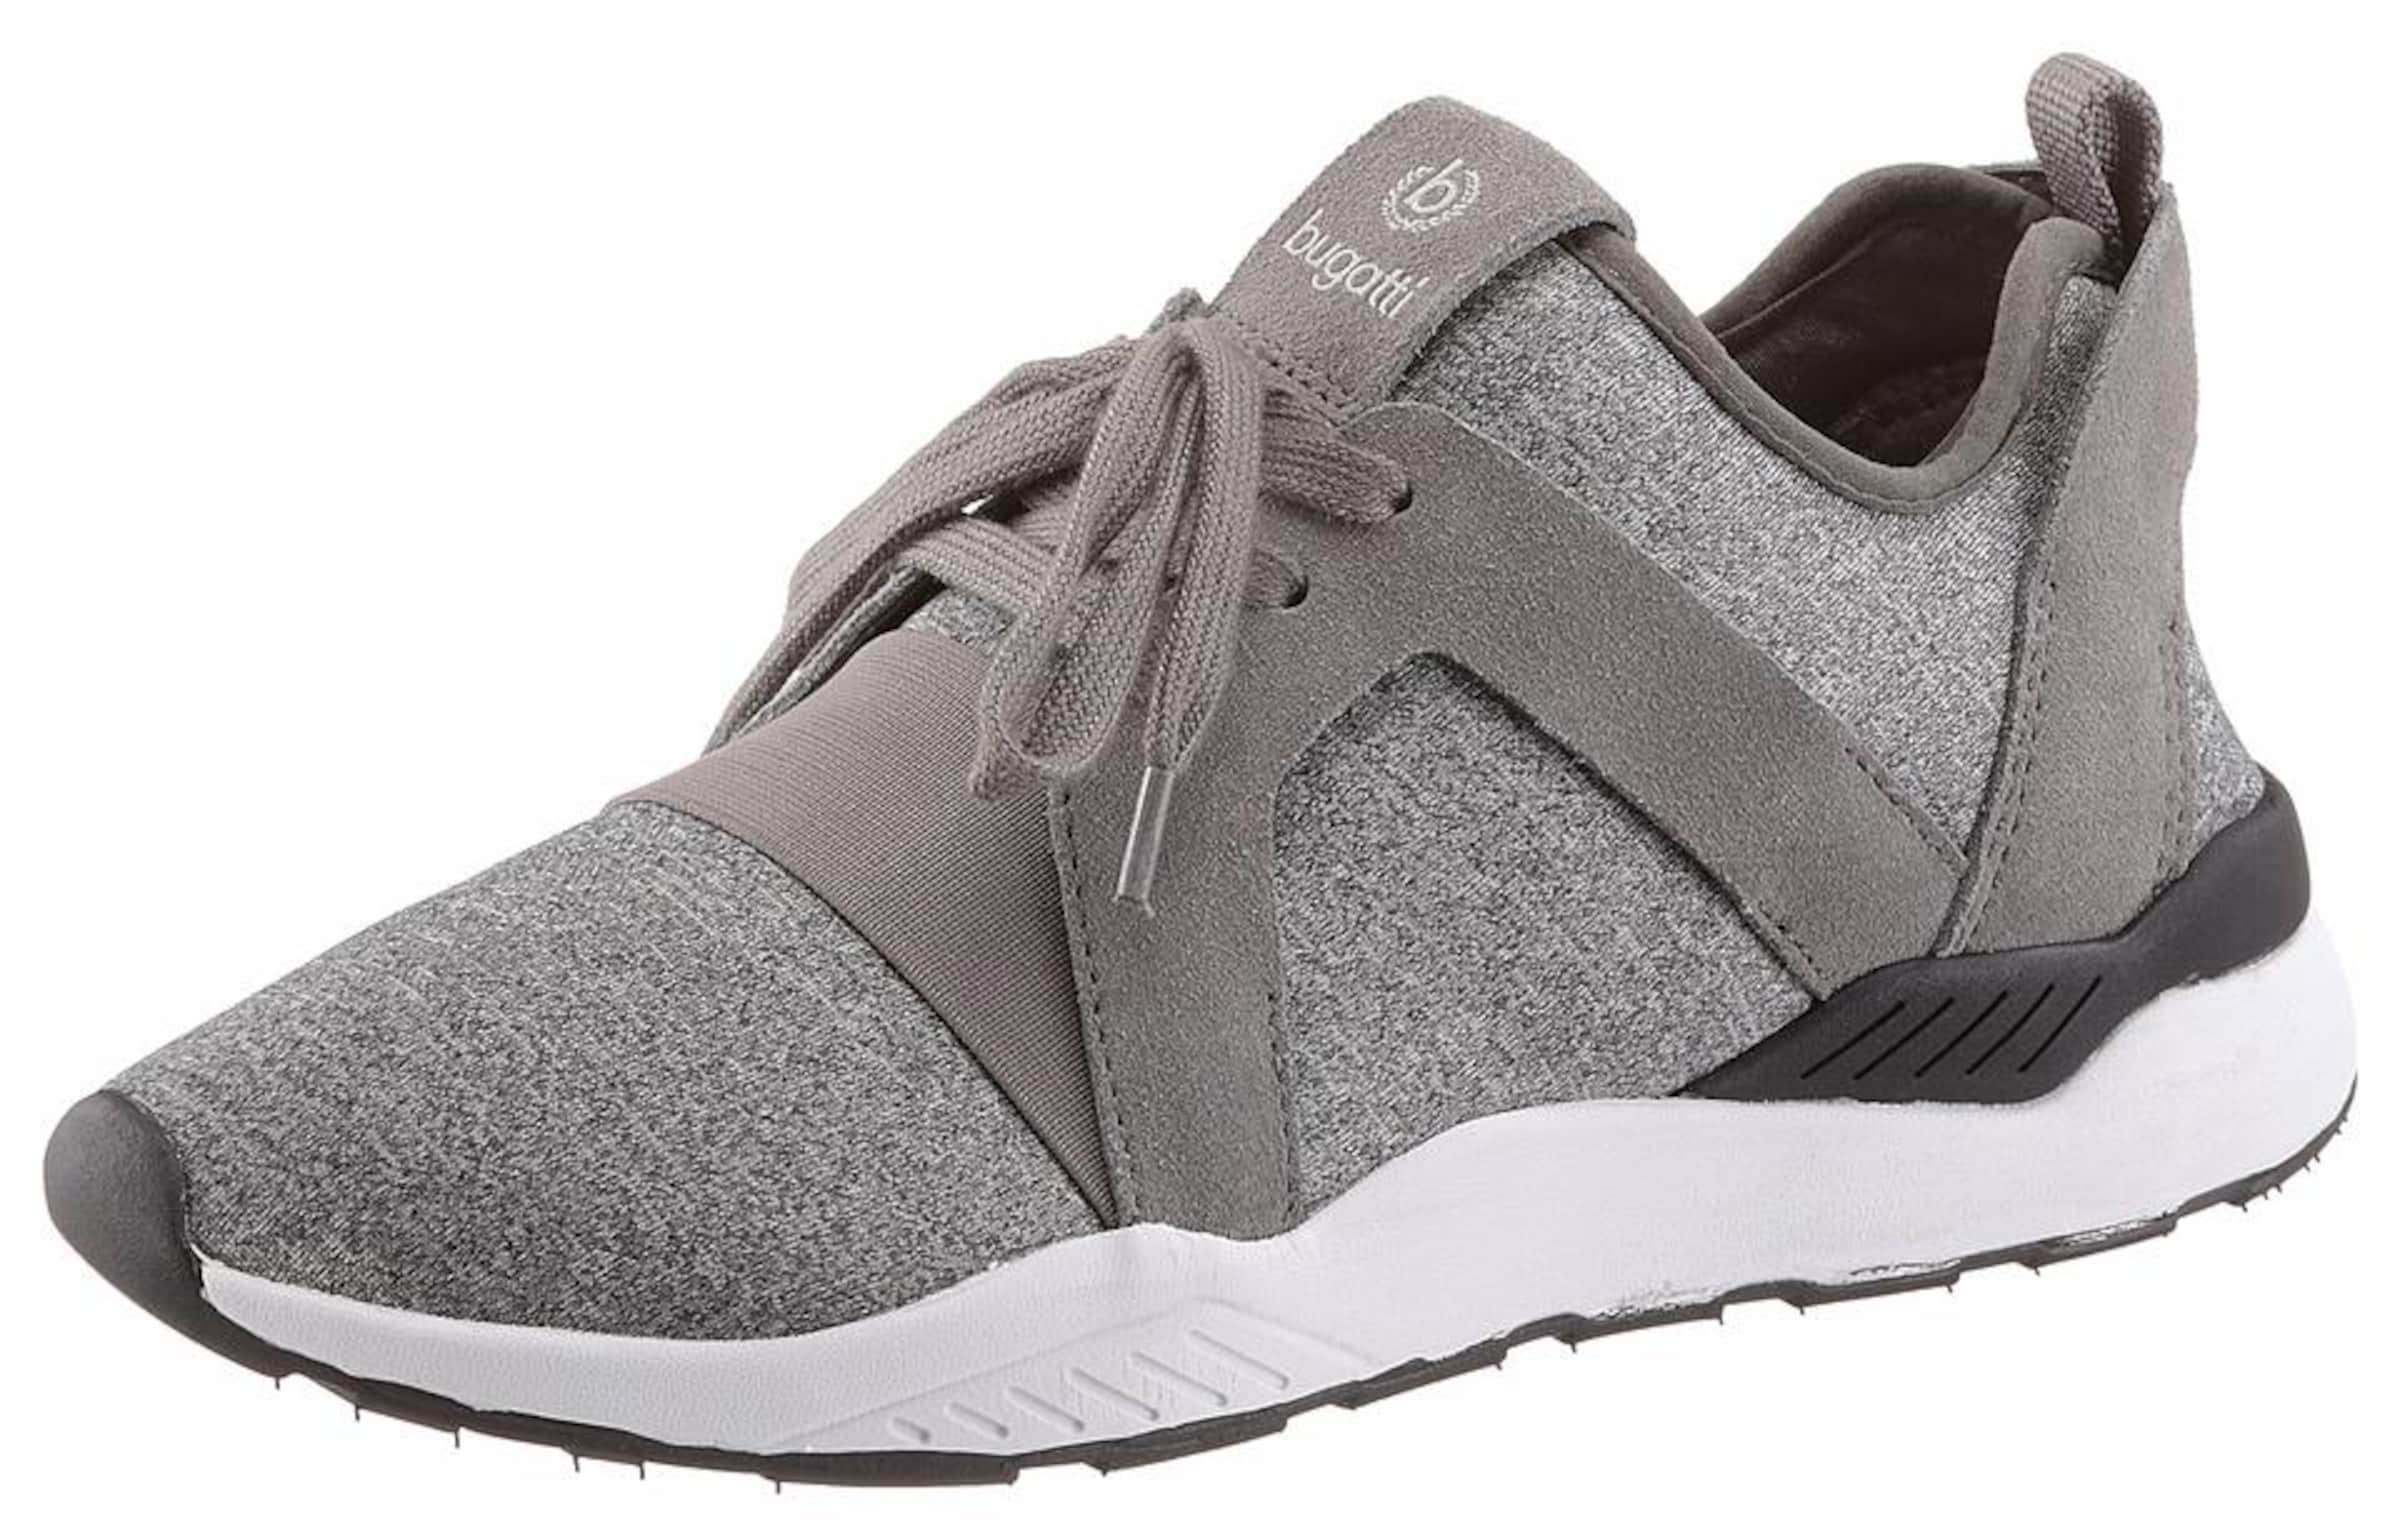 Haltbare Mode billige Schuhe bugatti | Slipper Schuhe Gut getragene Schuhe